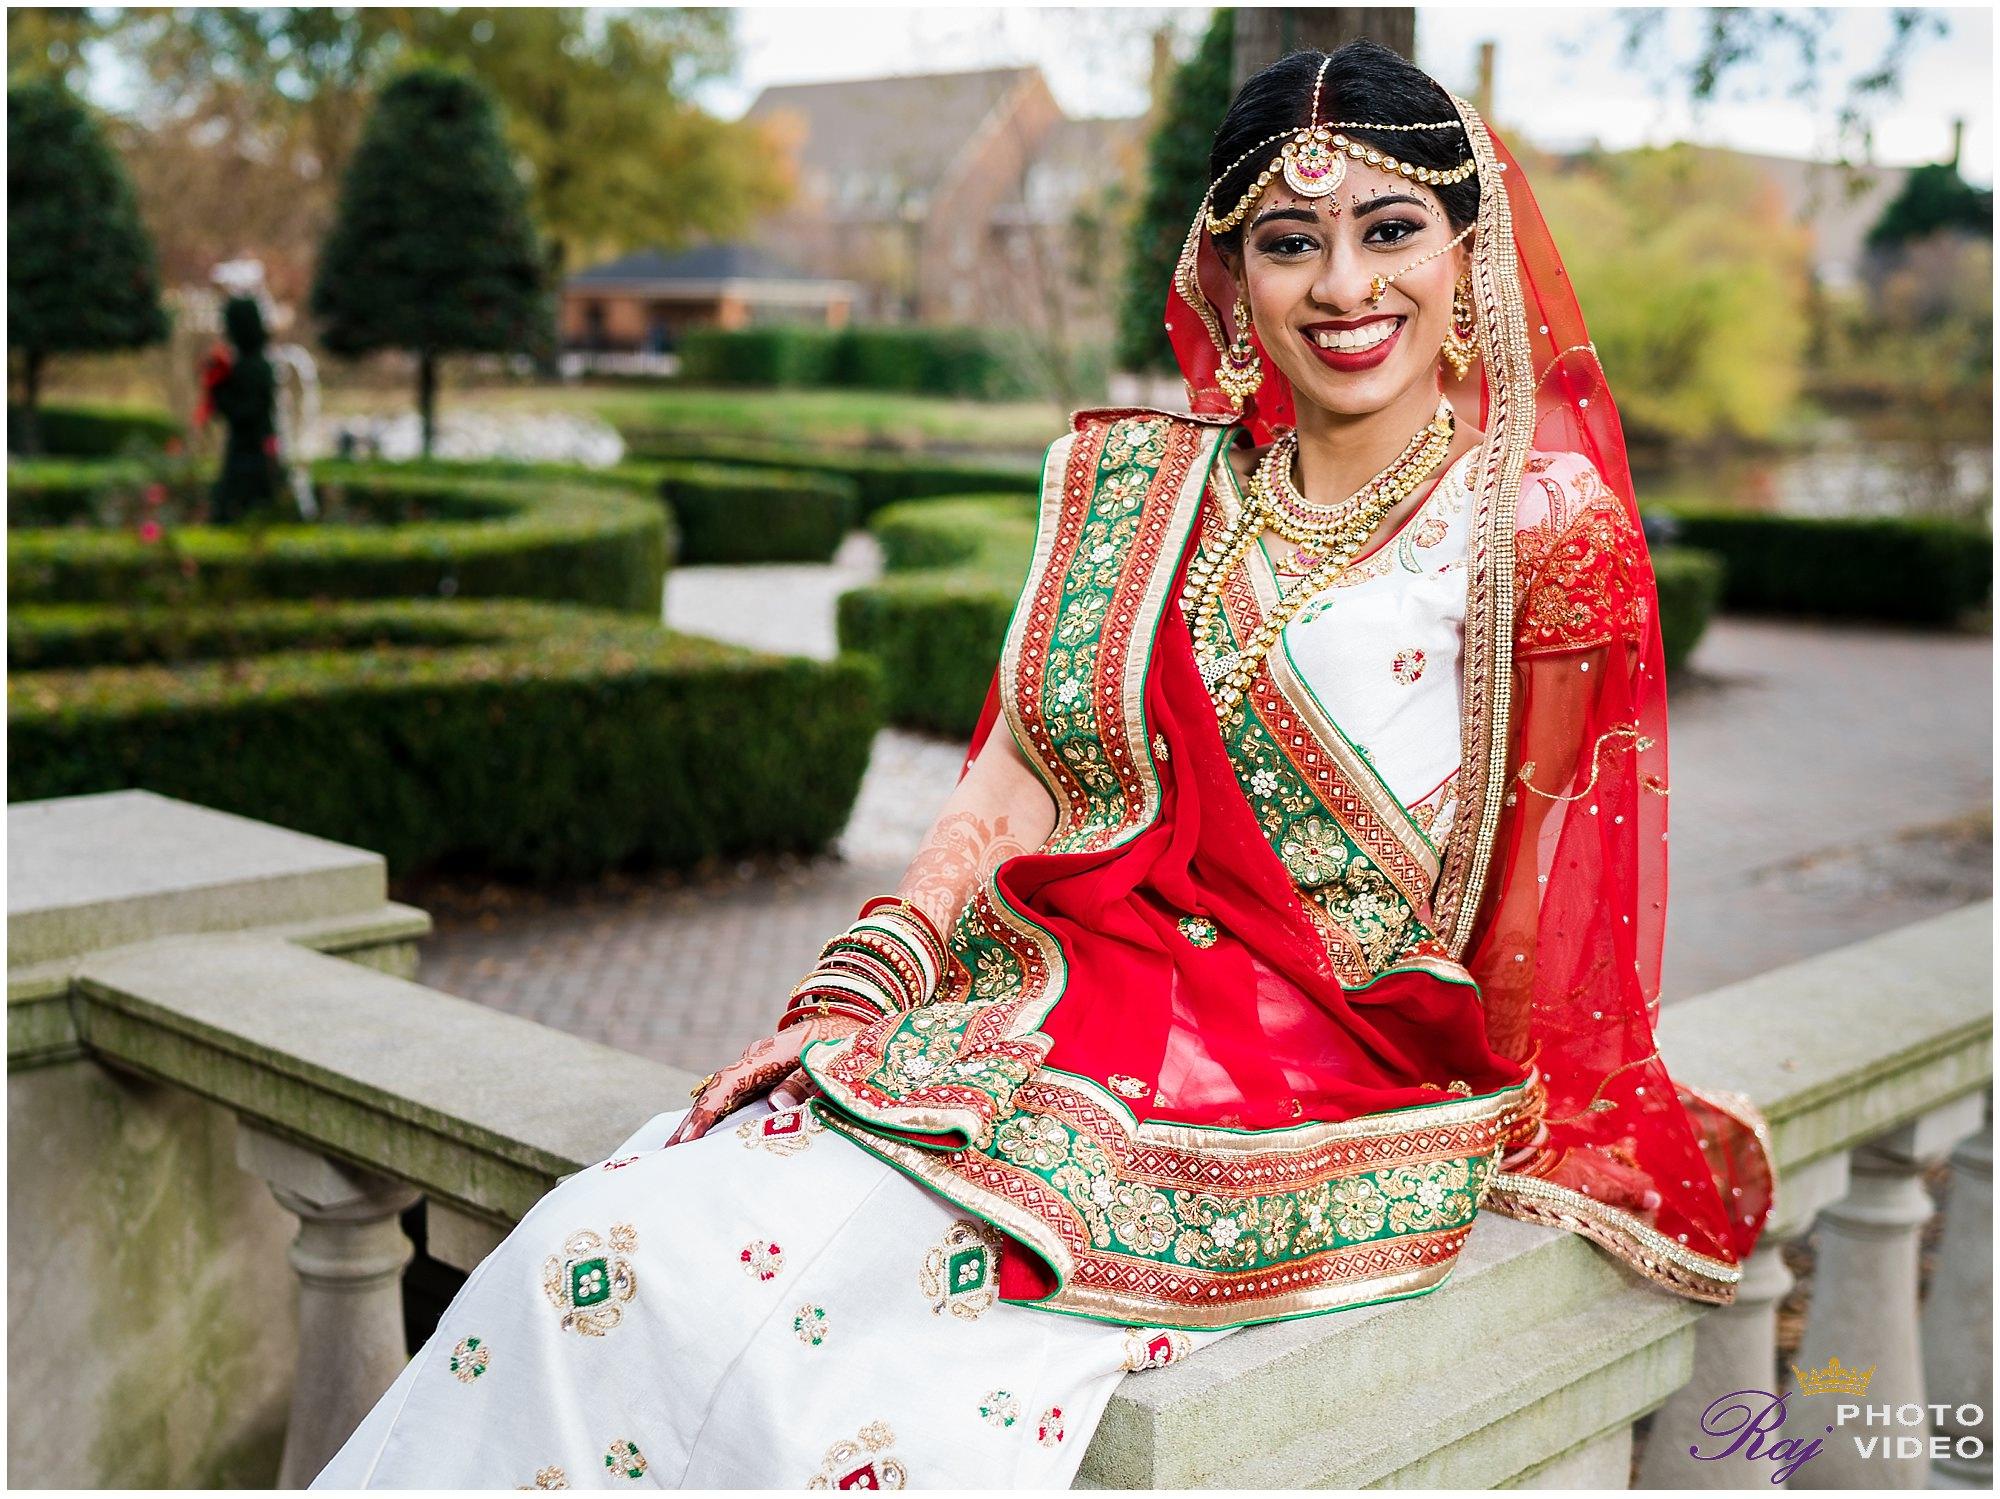 Founders-Inn-and-Spa-Virginia-Beach-VA-Indian-Wedding-Harini-Vivek-58.jpg